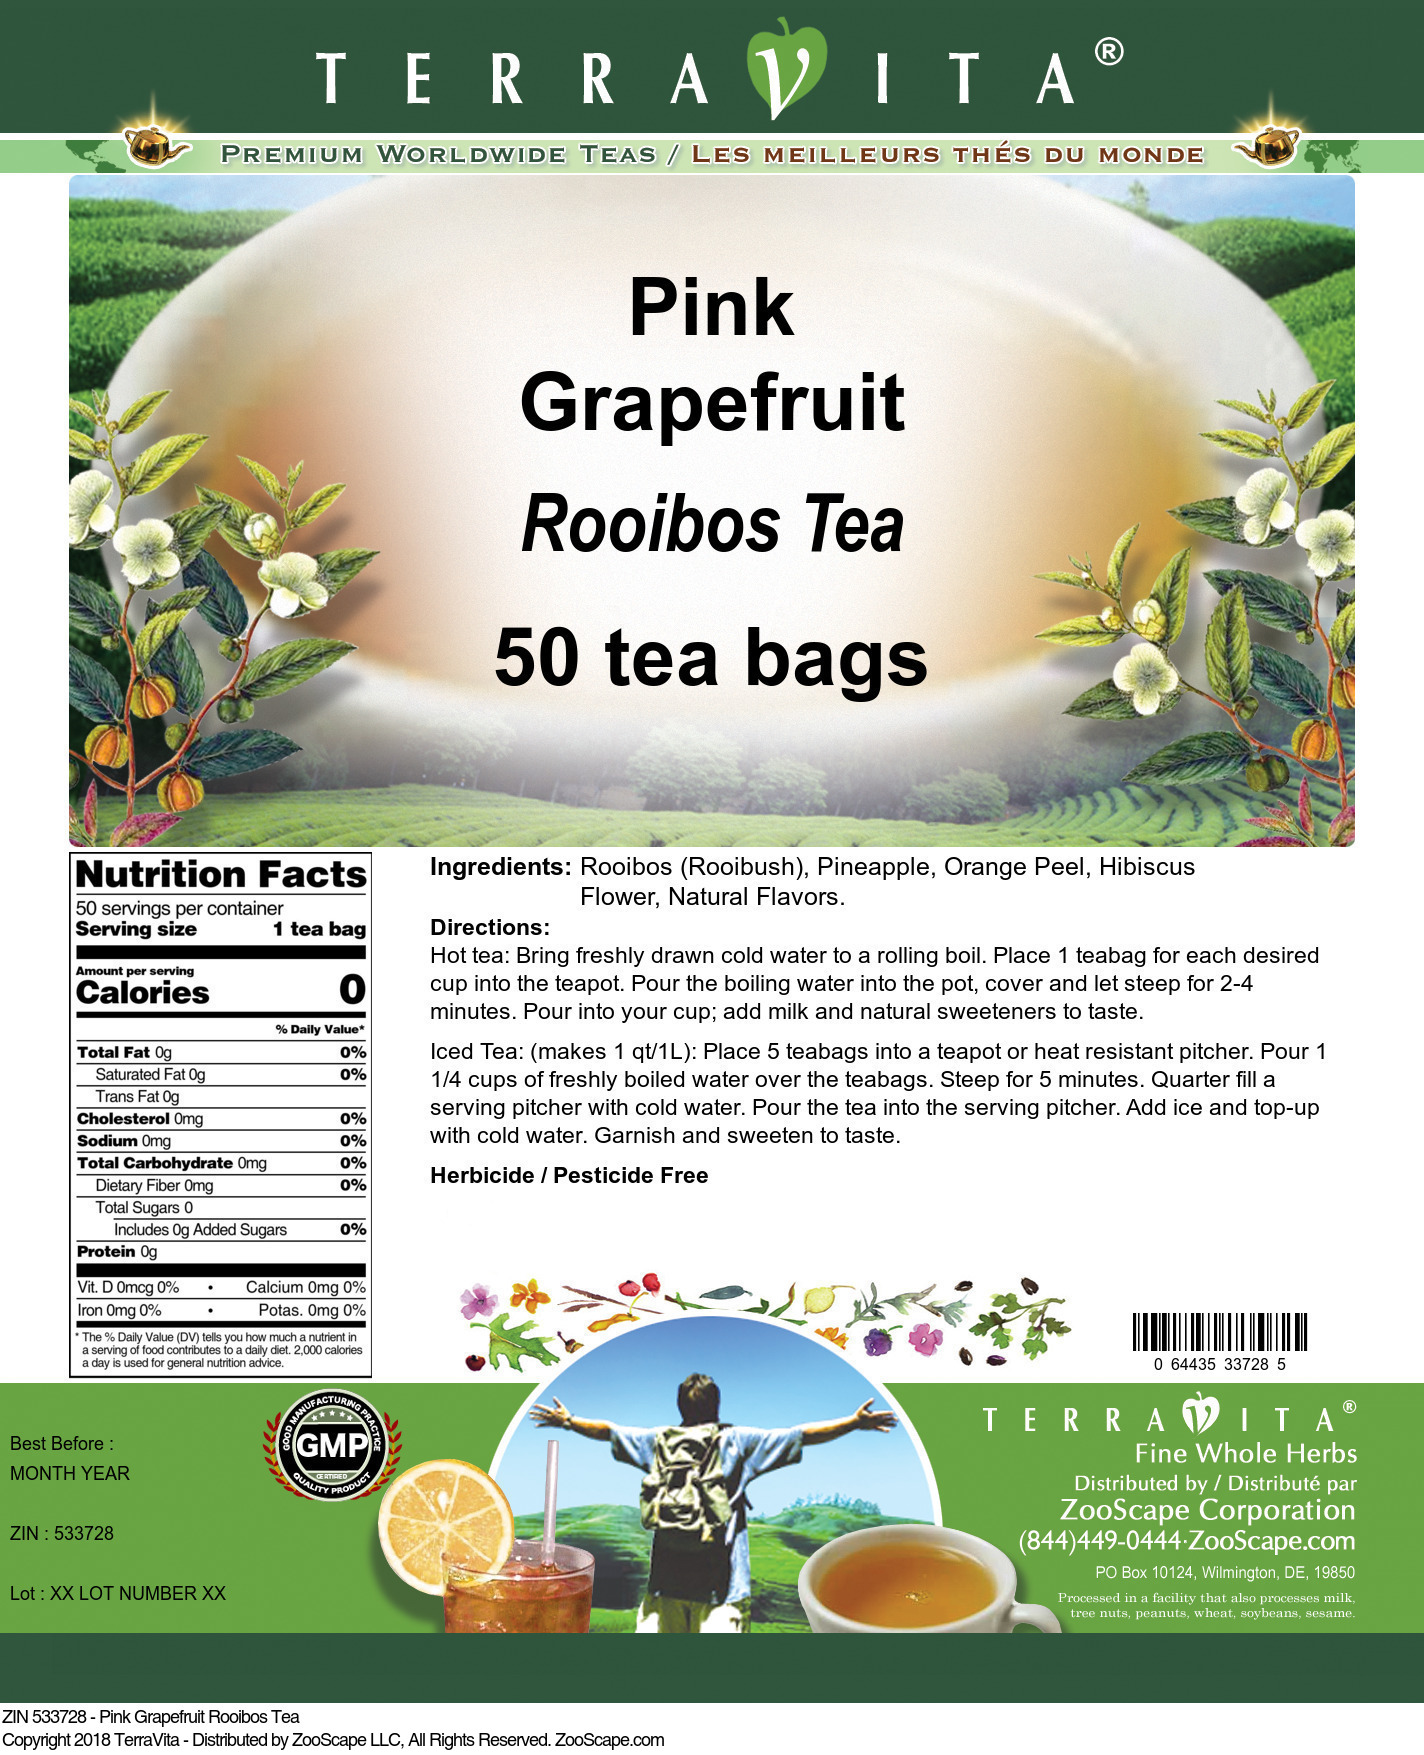 Pink Grapefruit Rooibos Tea